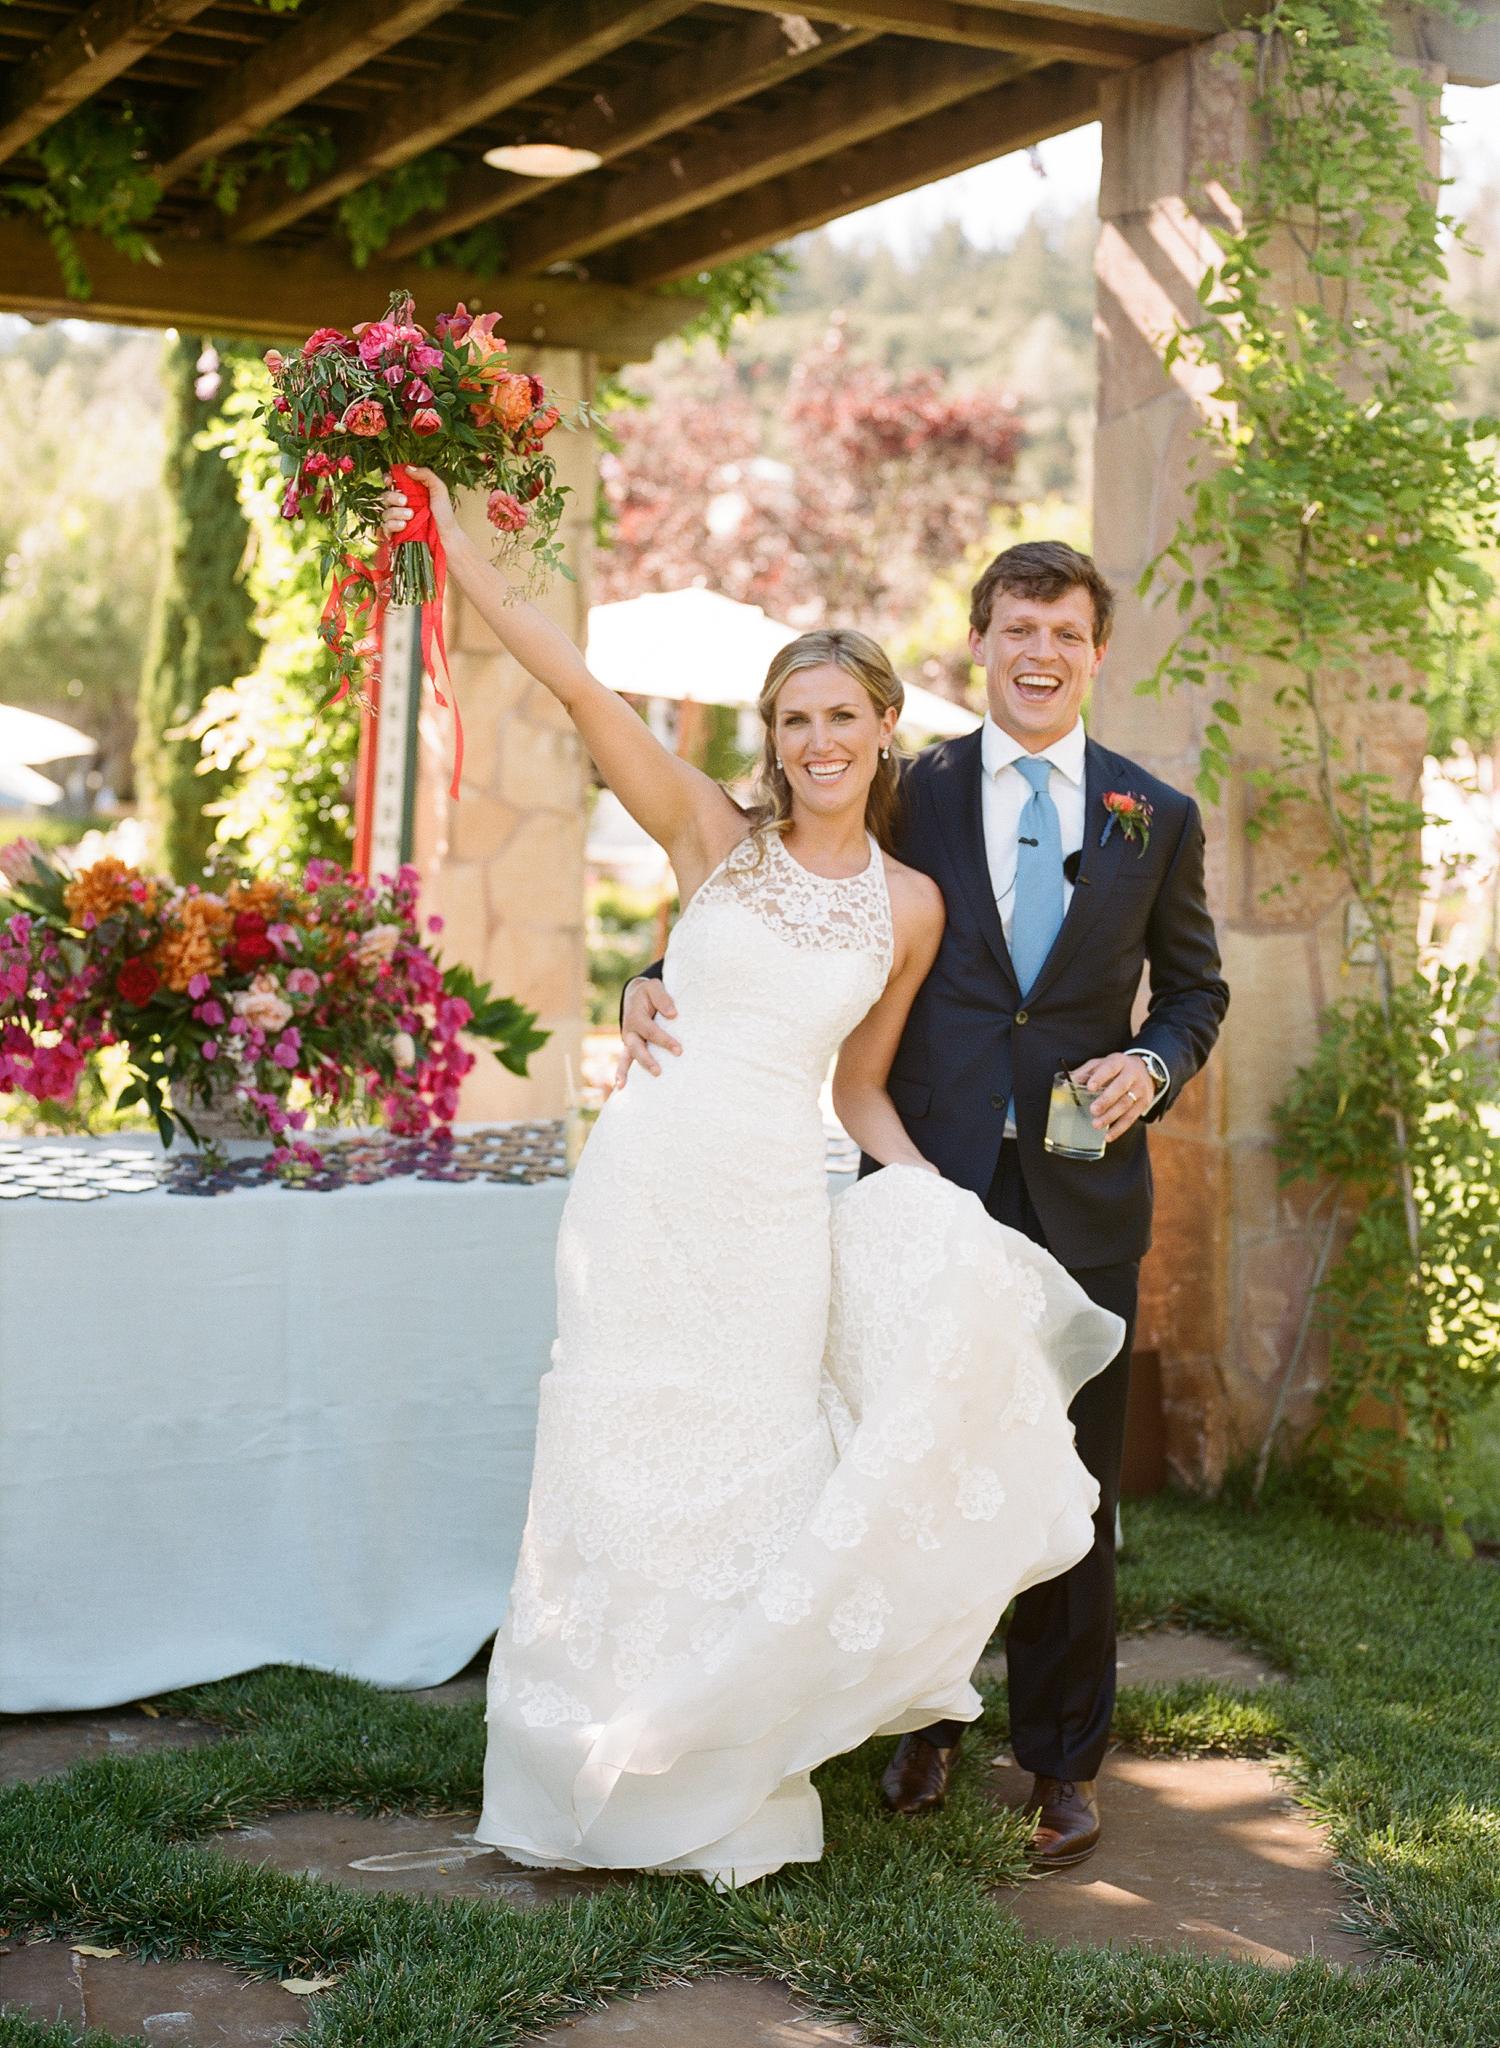 25-bride-groom-toasting.jpg